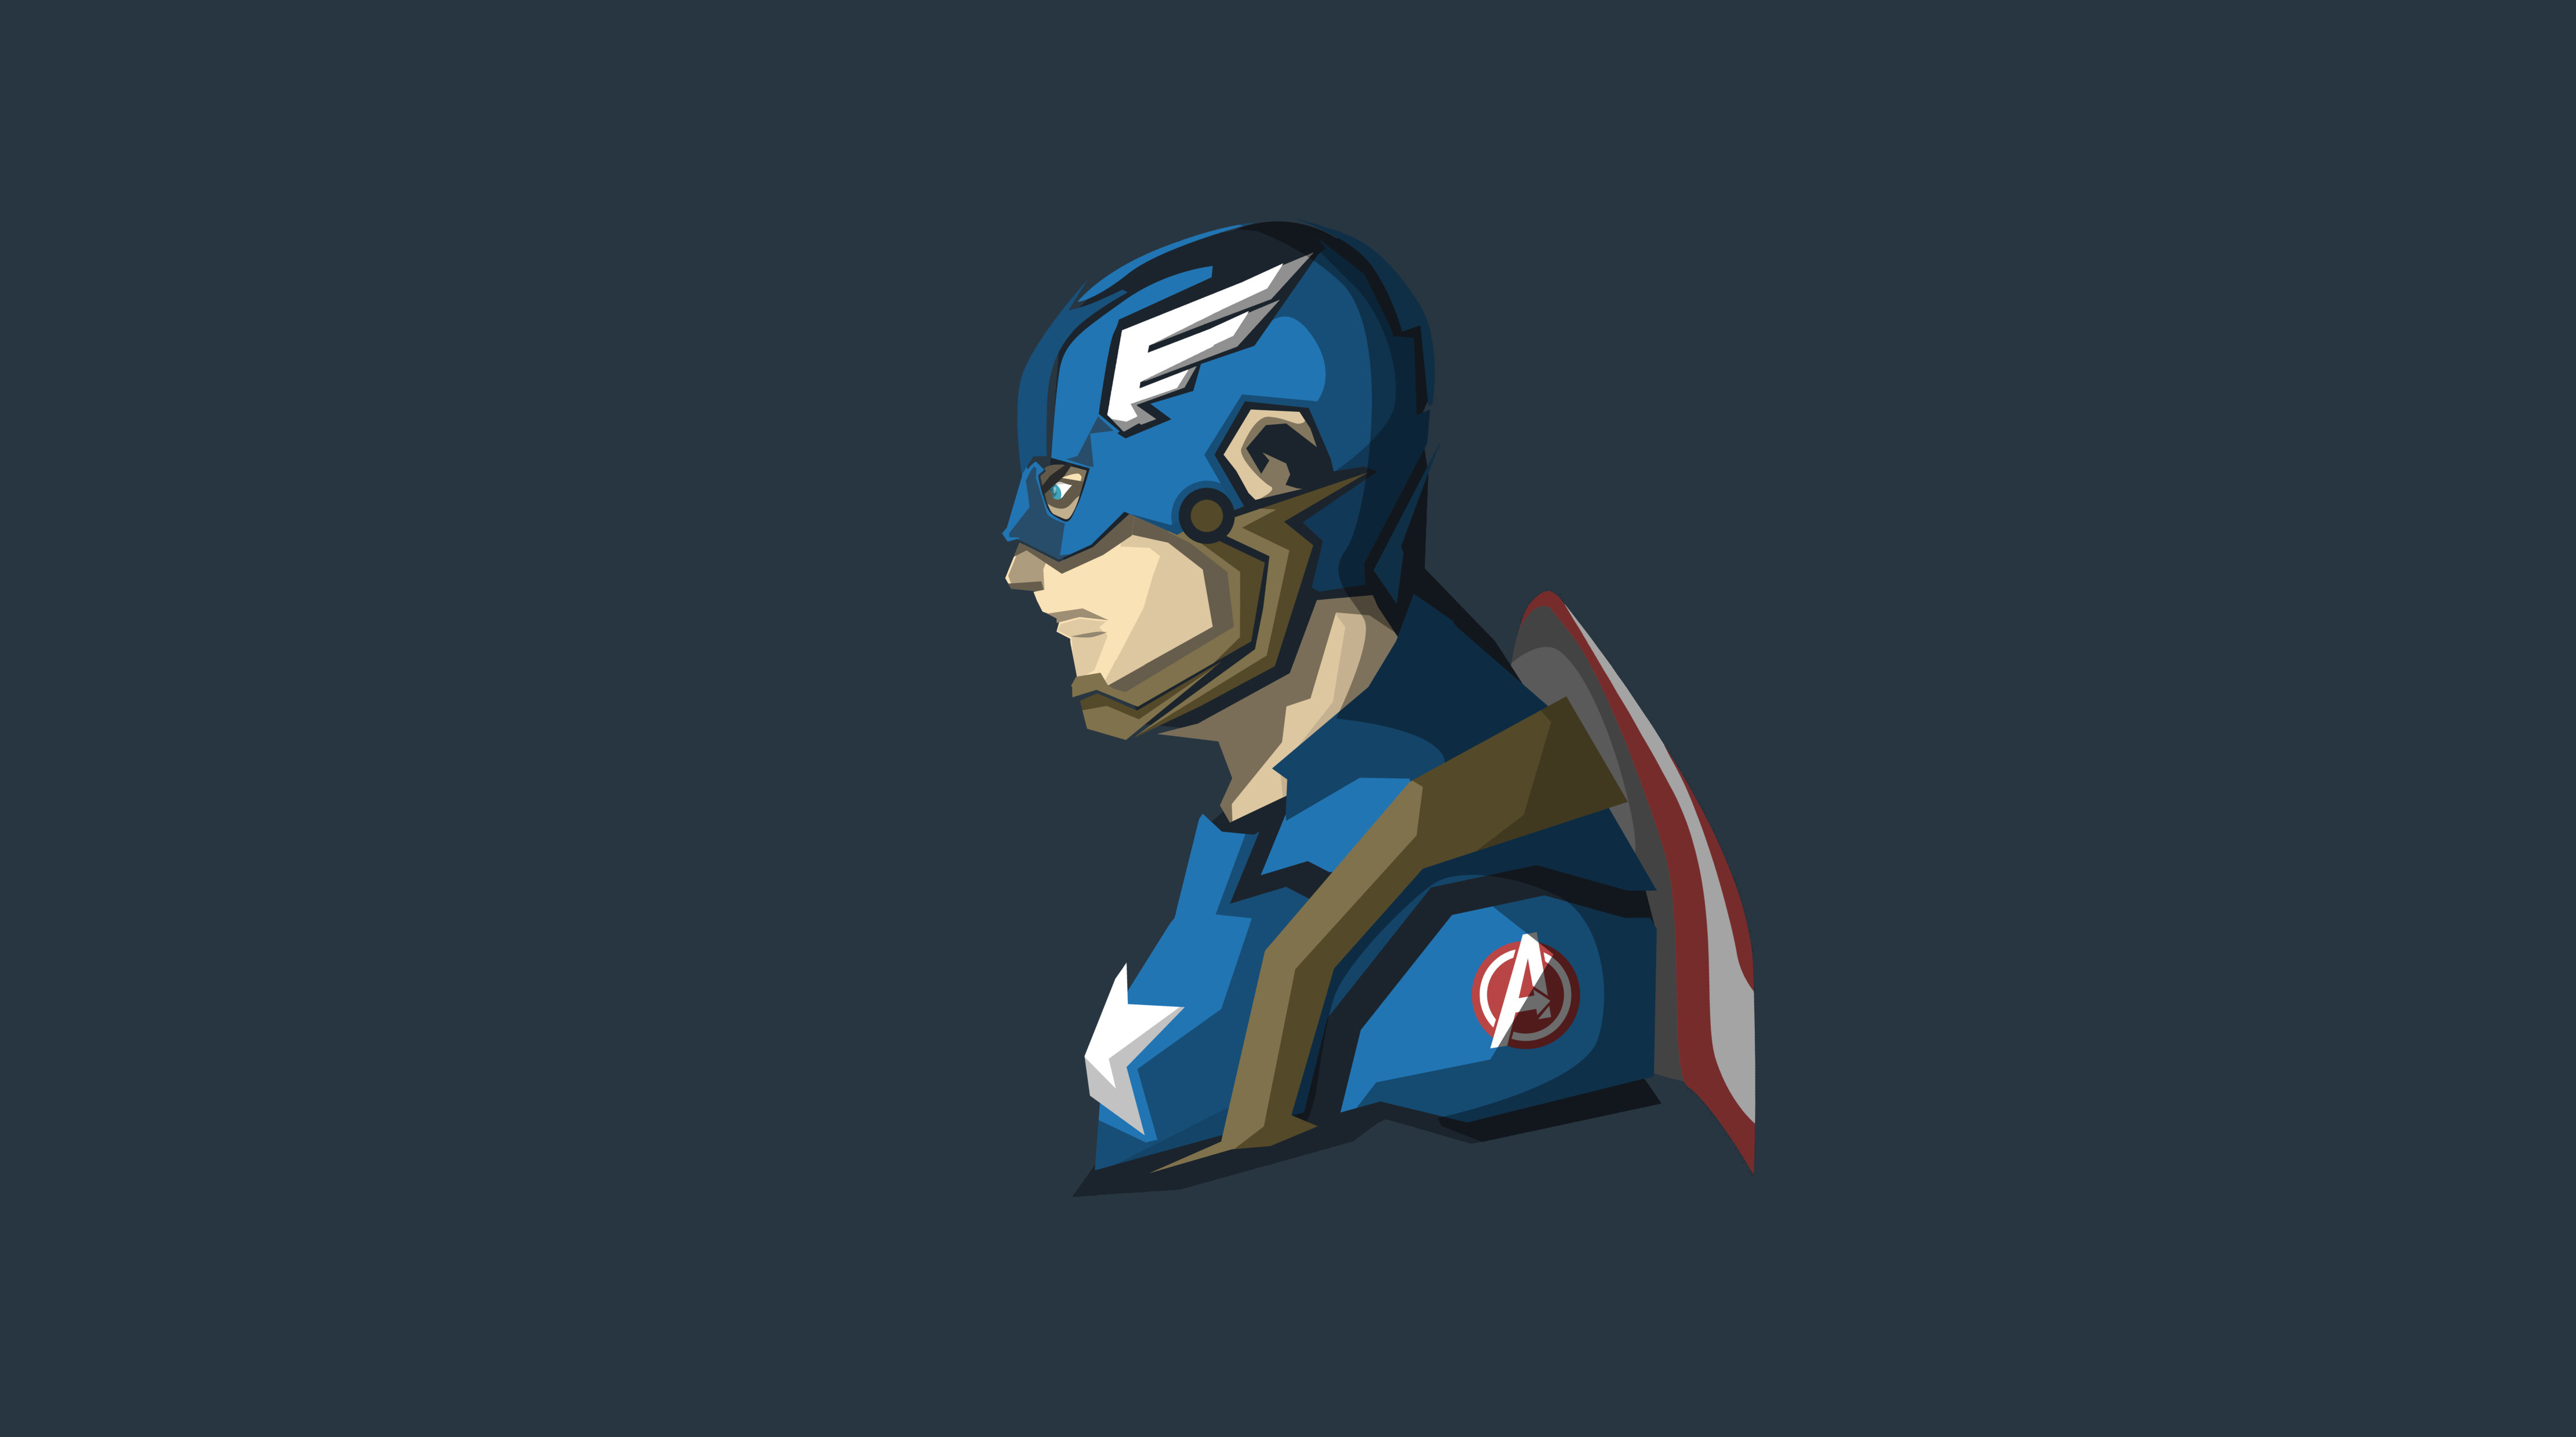 Captain America 4k Minimalism Hd Superheroes 4k Wallpapers